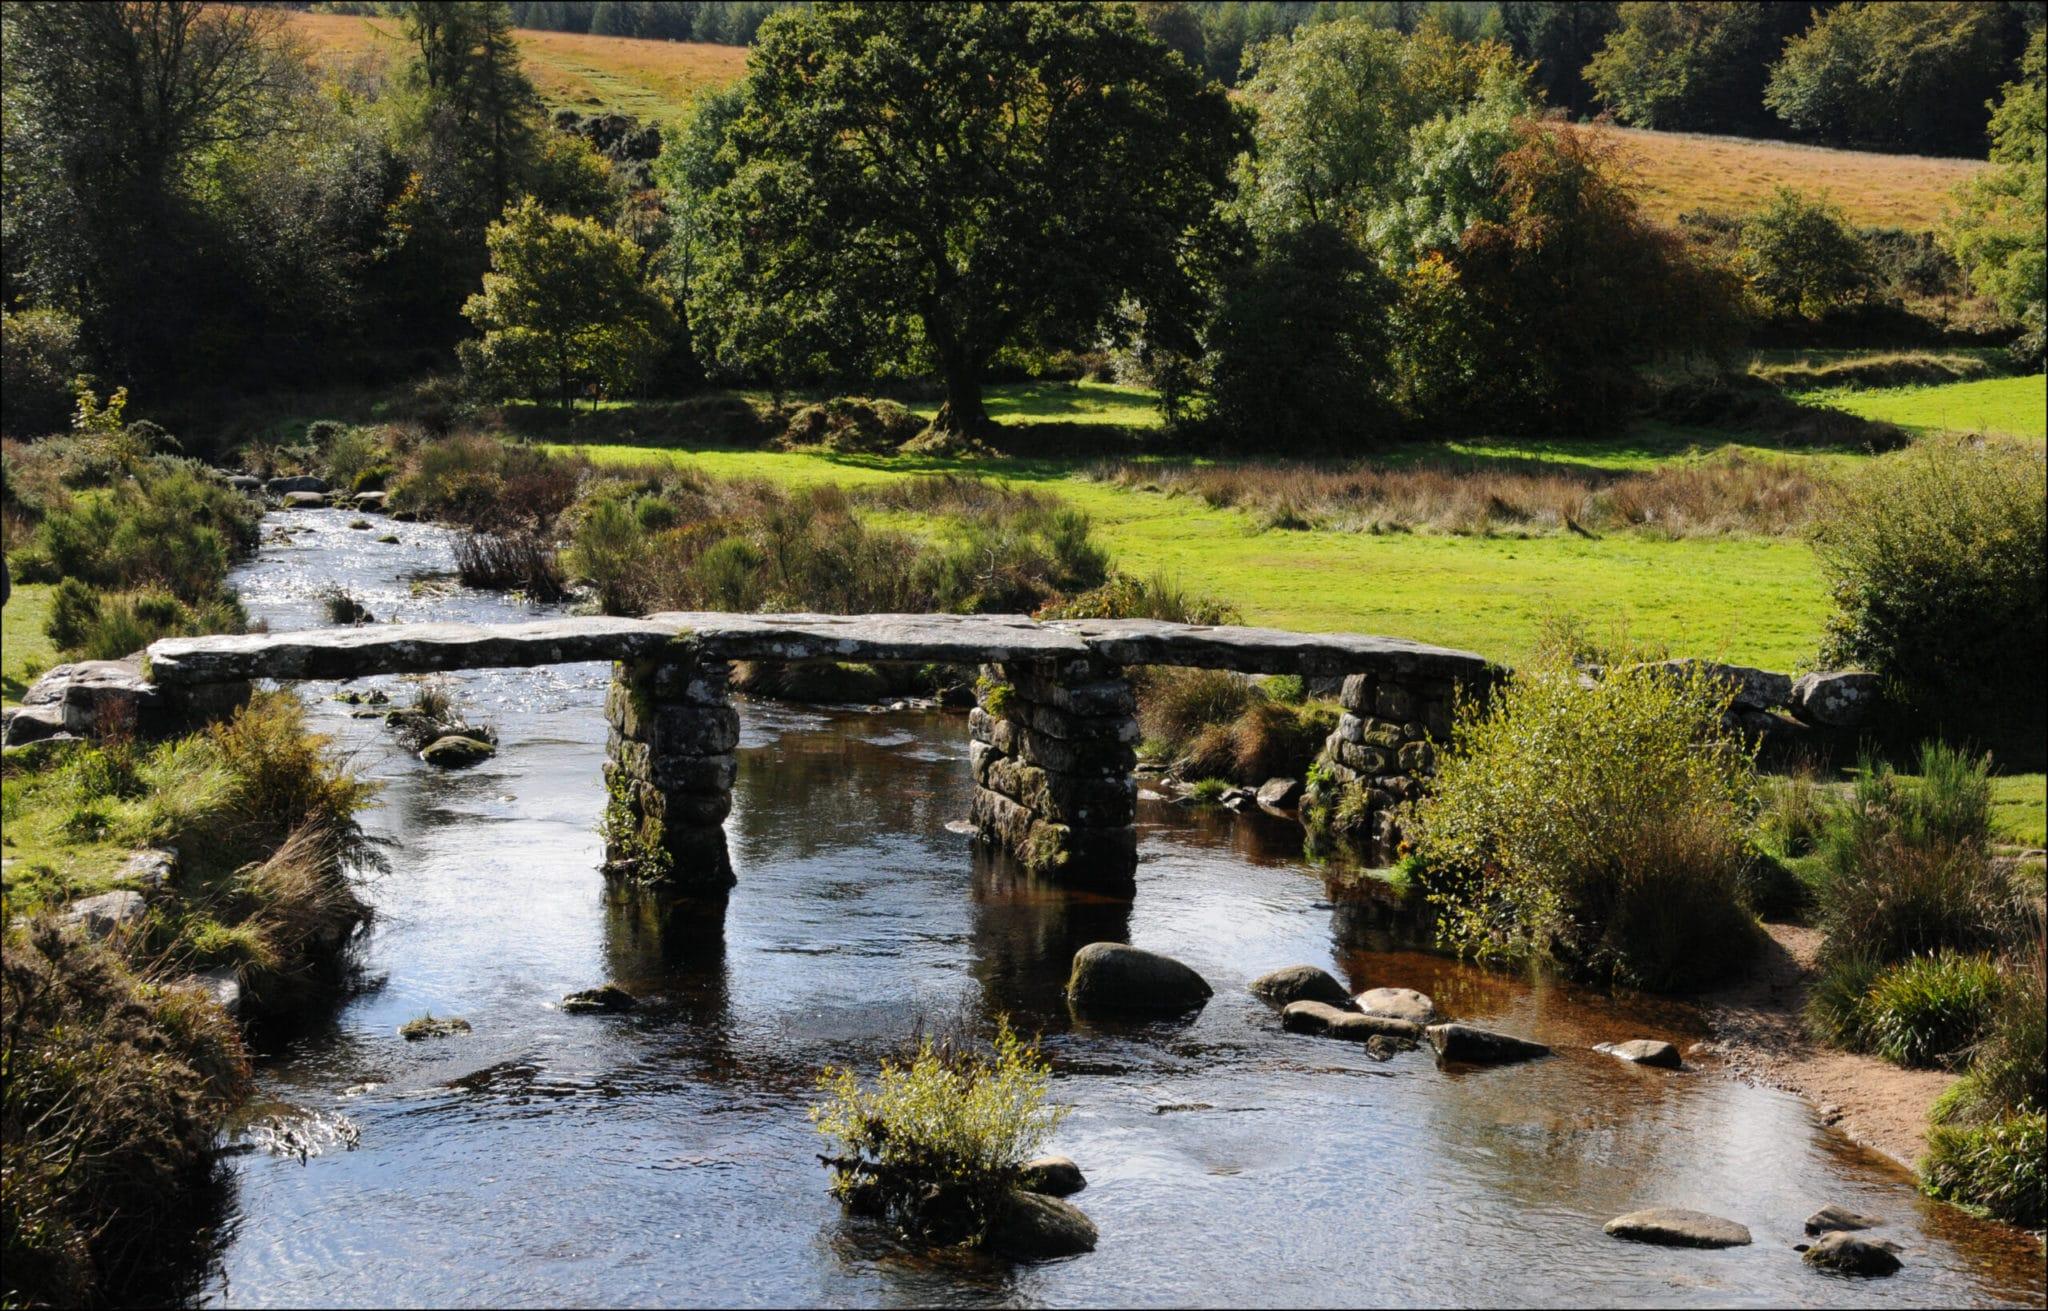 Postbridge on Dartmoor